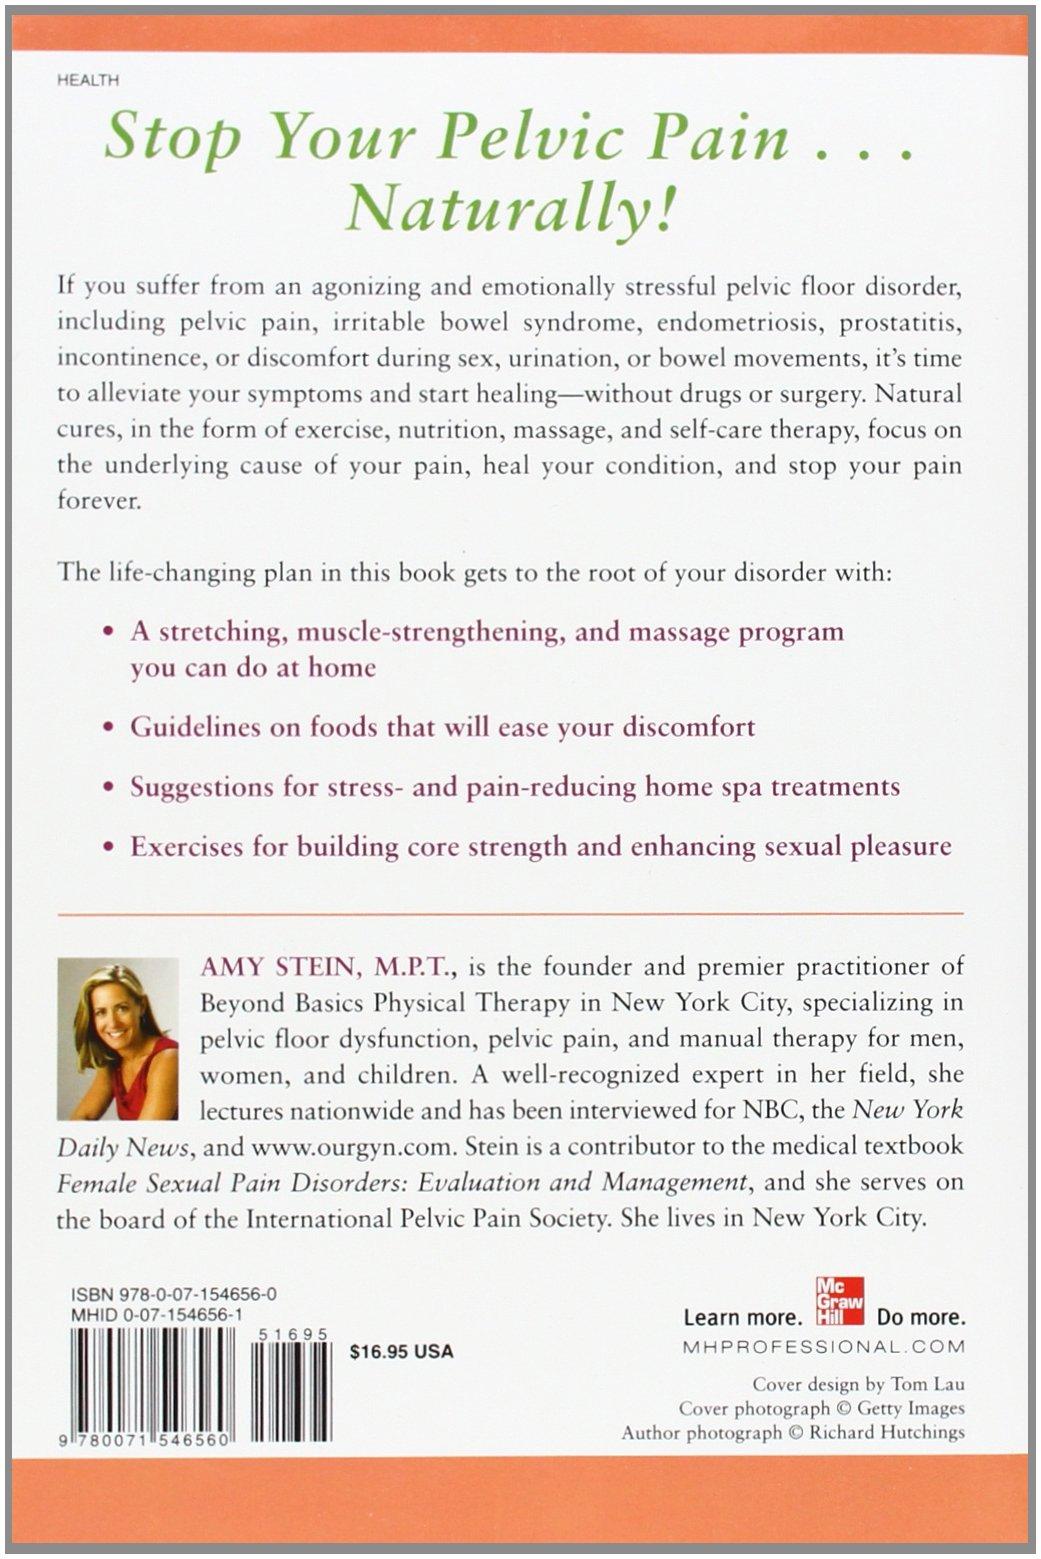 Books Dvd S And Cd S Heal Pelvic Pain Book